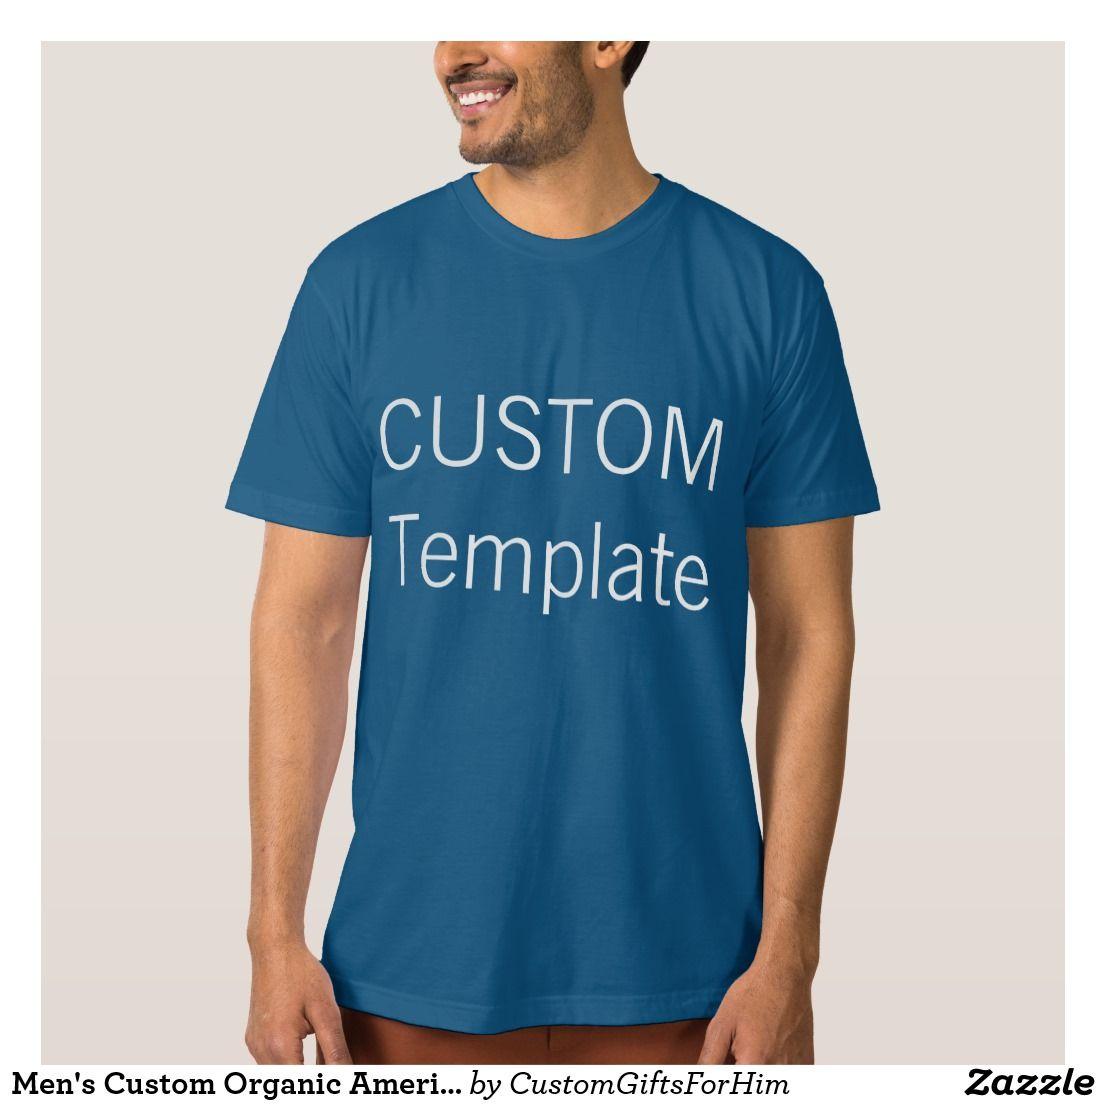 Design your own t shirt american apparel - Men S Custom Organic American Apparel T Shirt